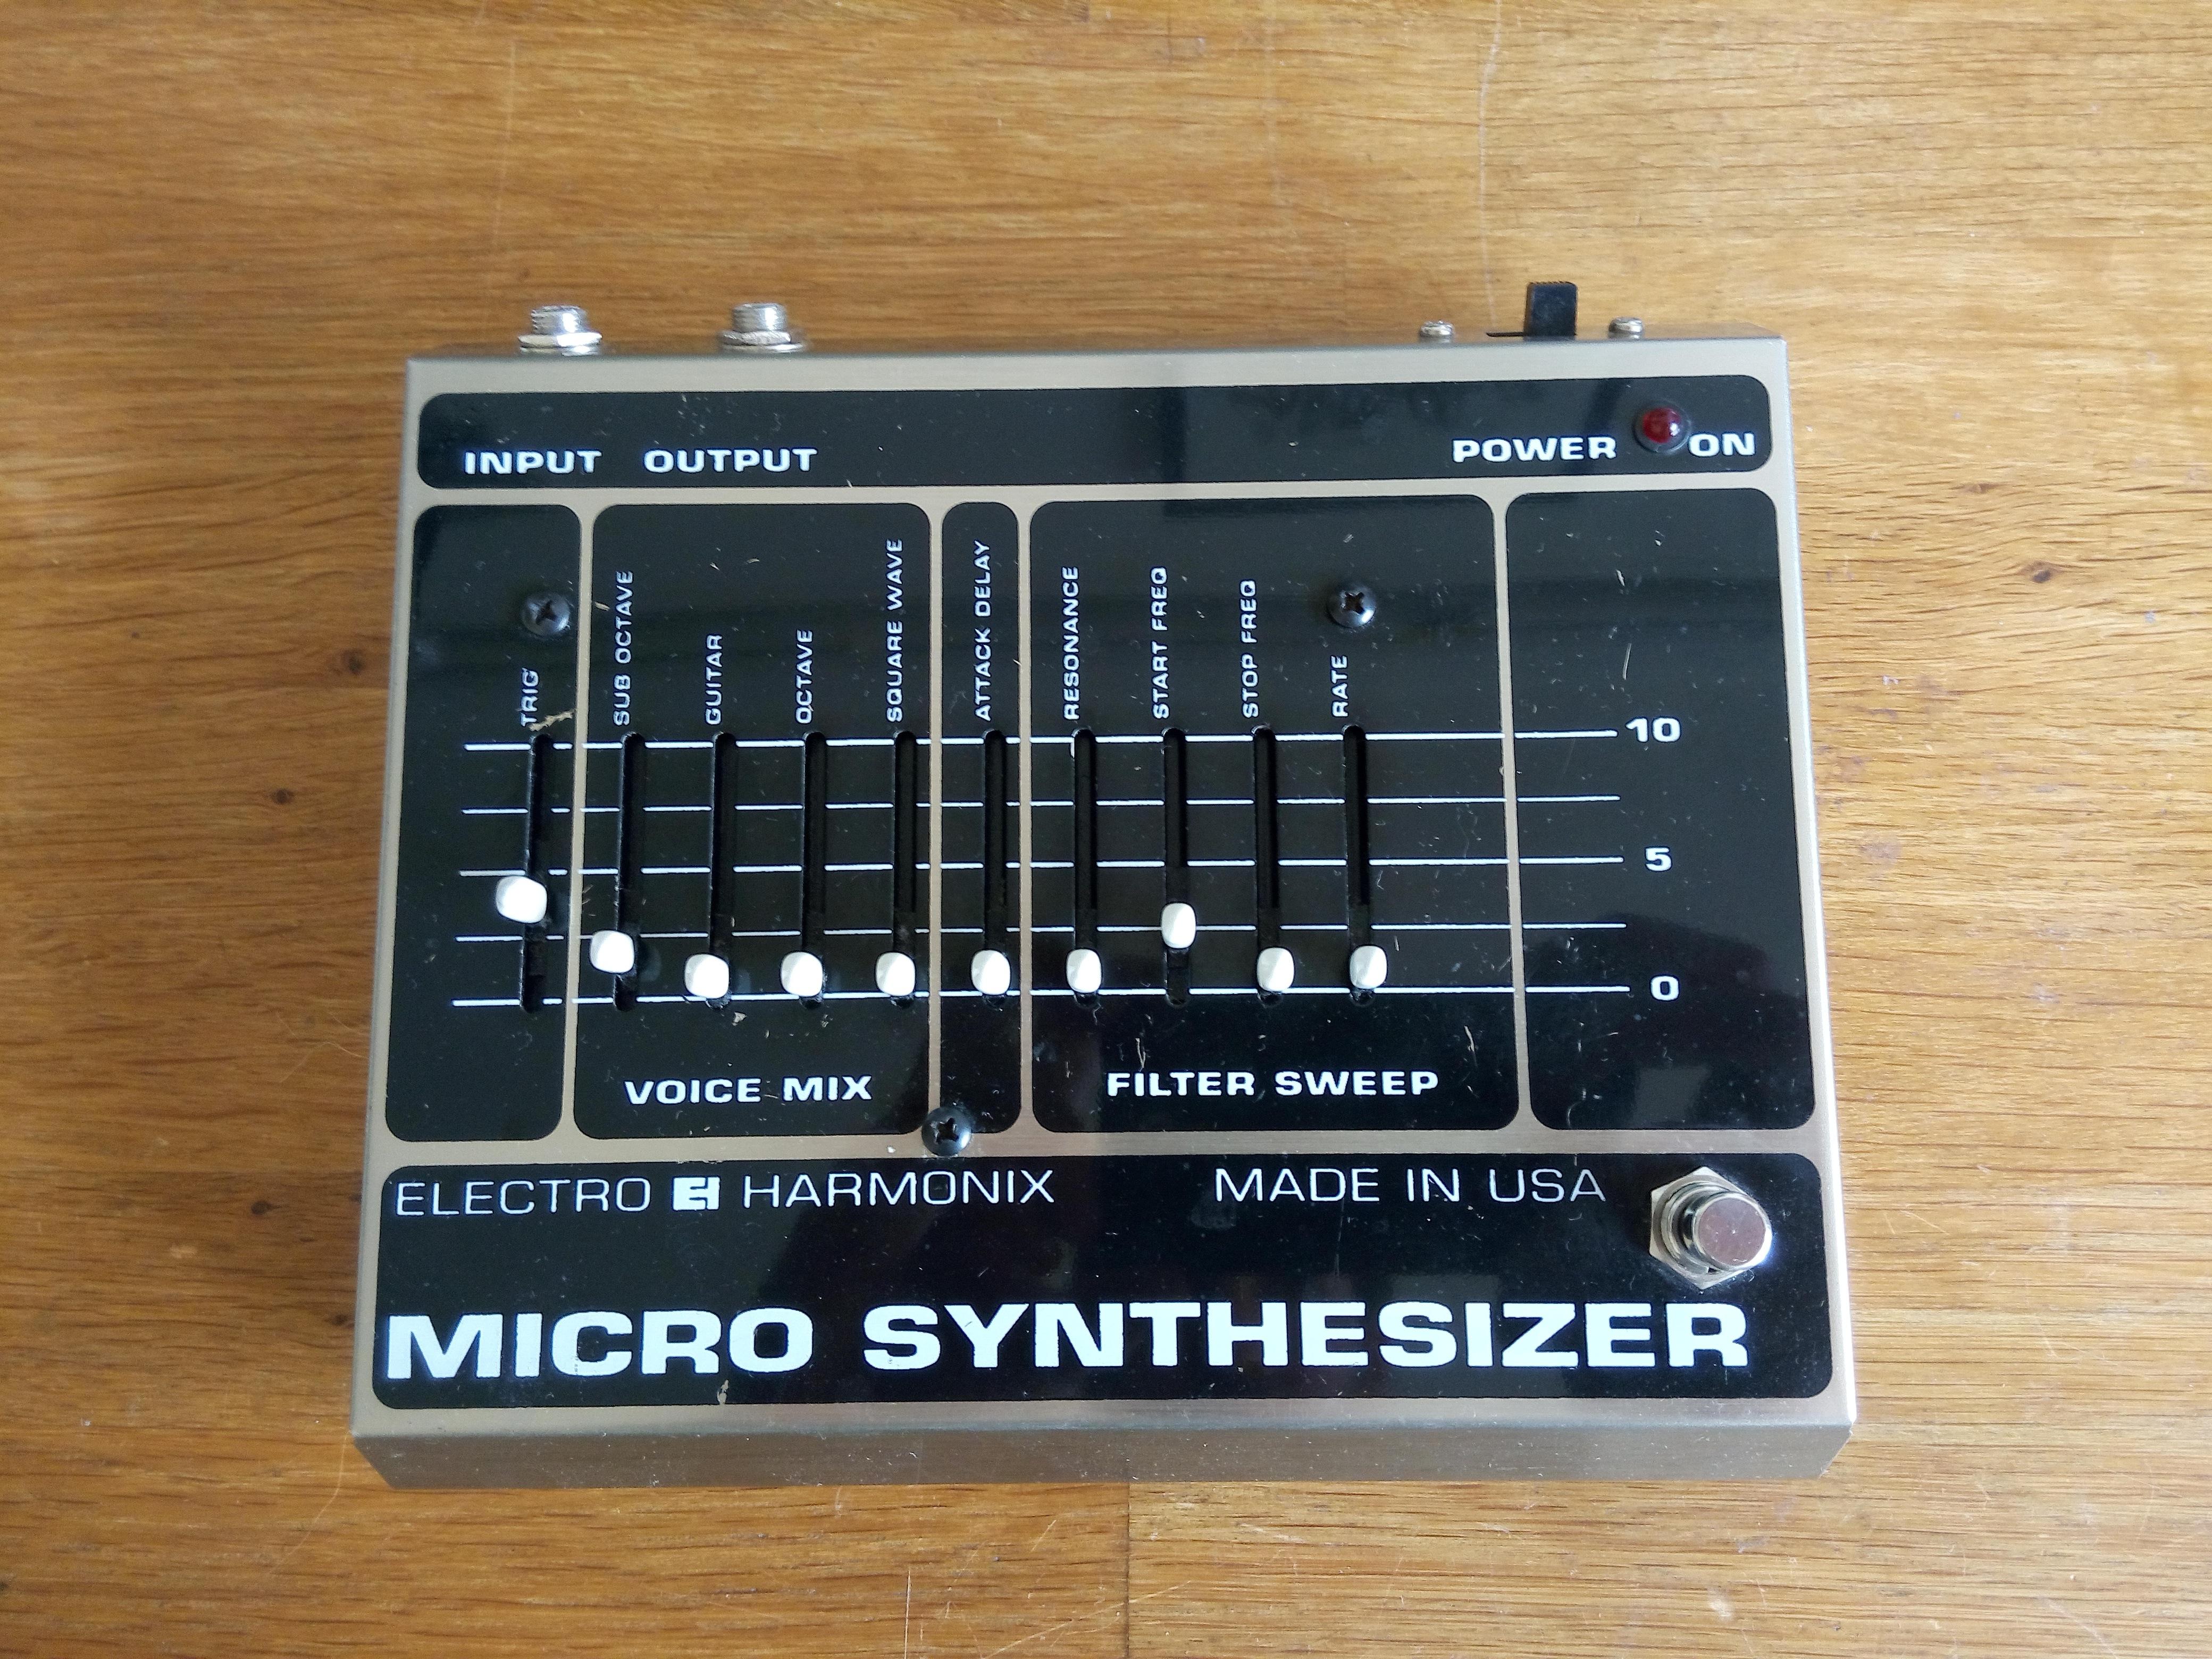 electro harmonix micro synthesizer original image 1923973 audiofanzine. Black Bedroom Furniture Sets. Home Design Ideas